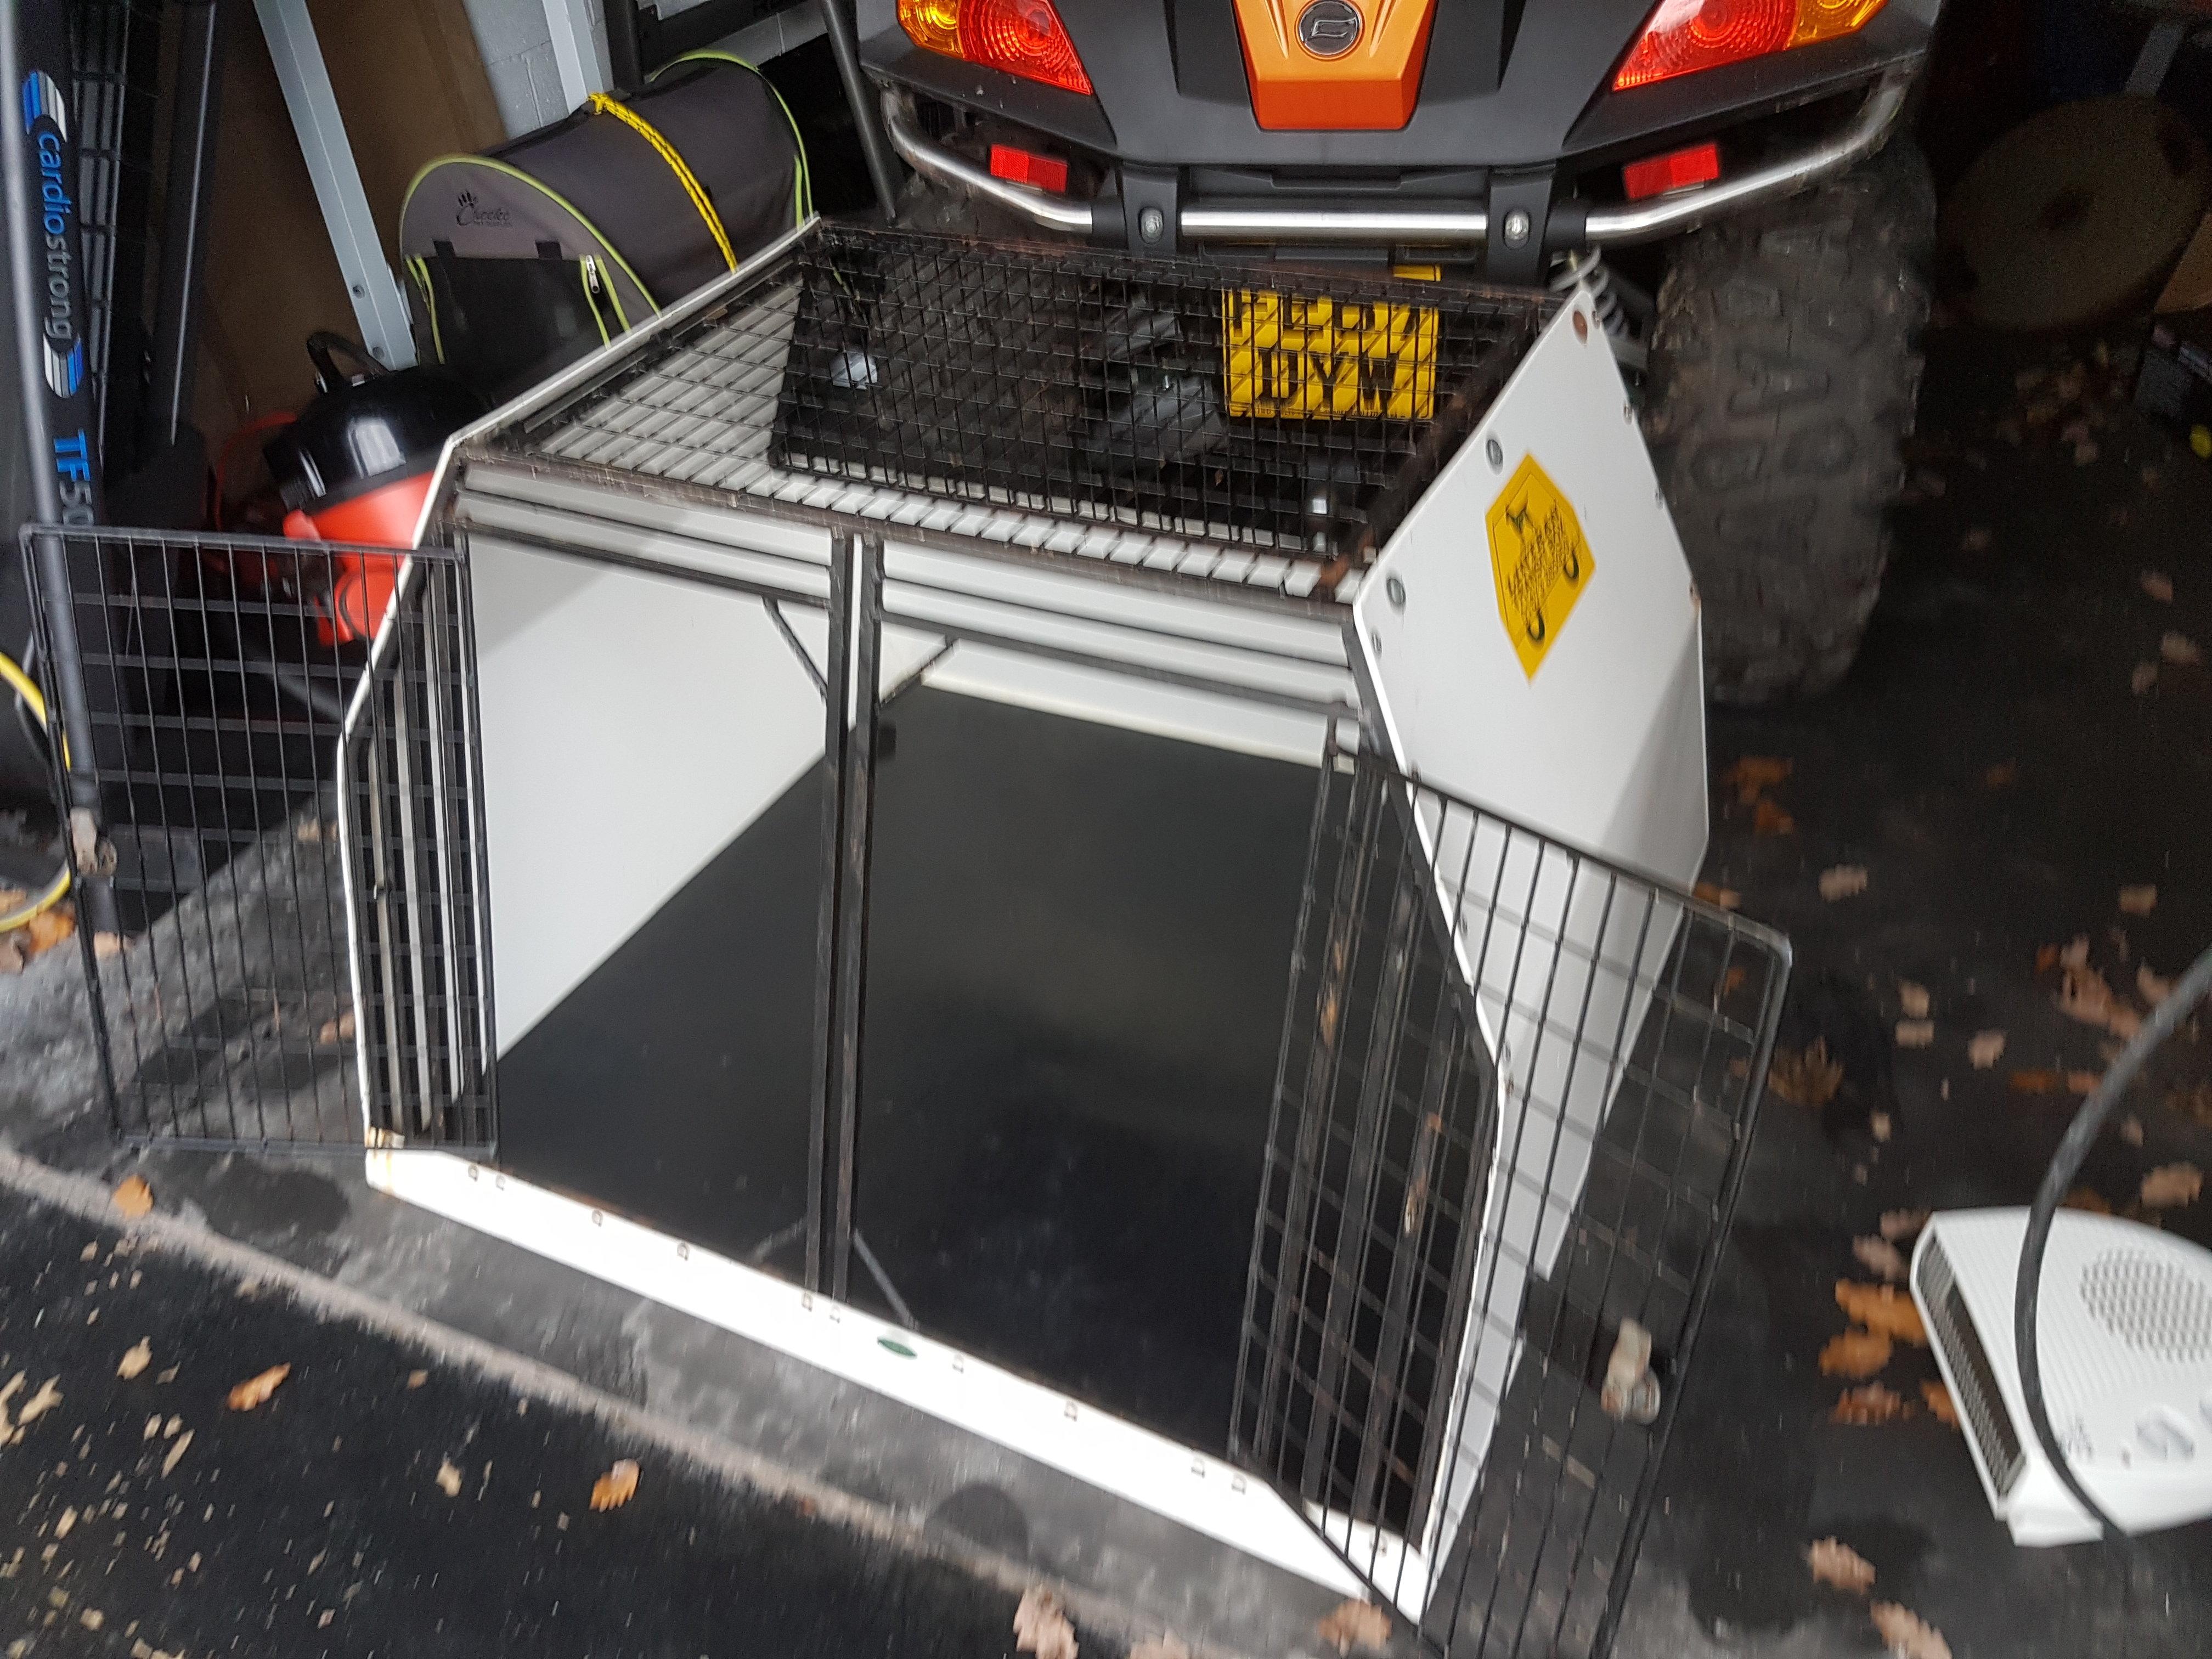 Large Lintran dog box